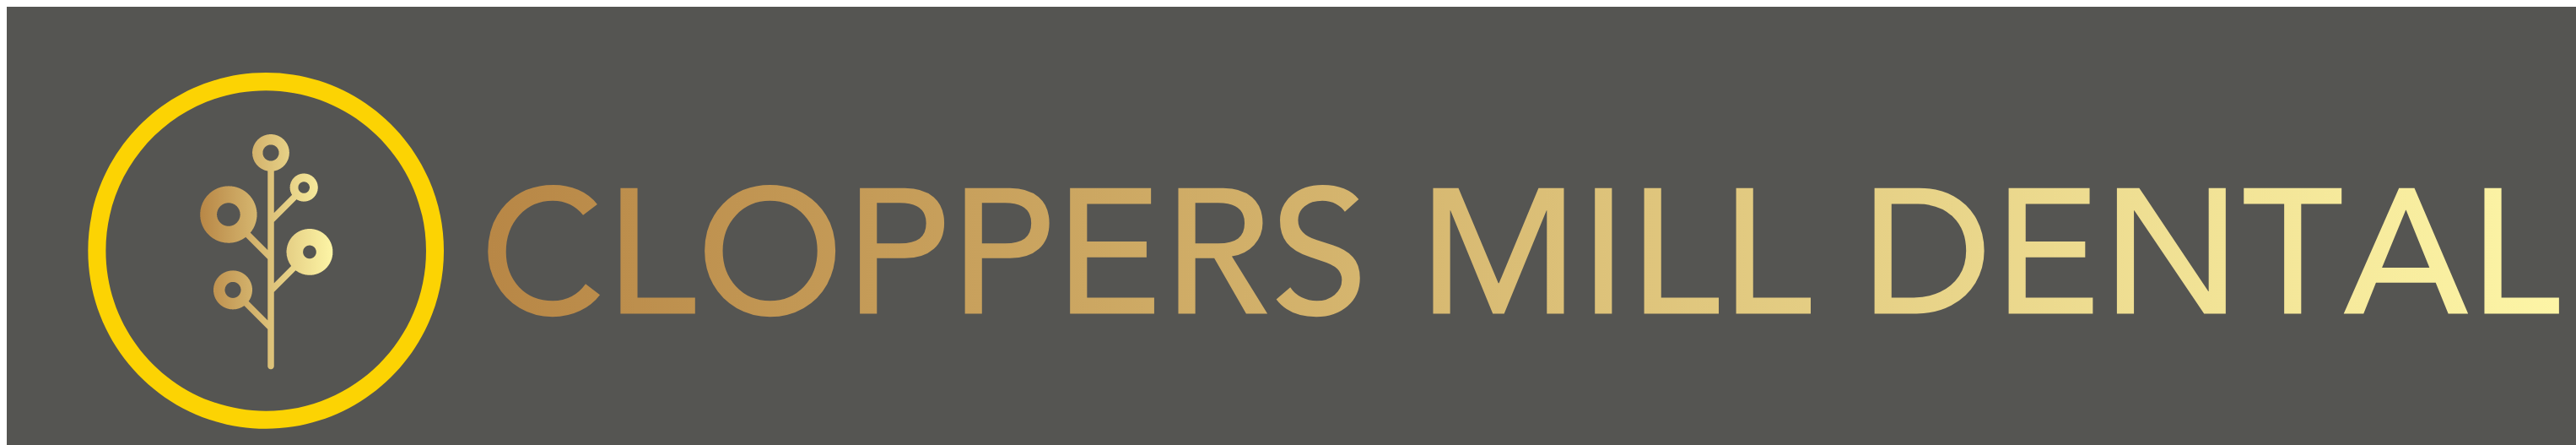 Clopper's Mill Dental Care